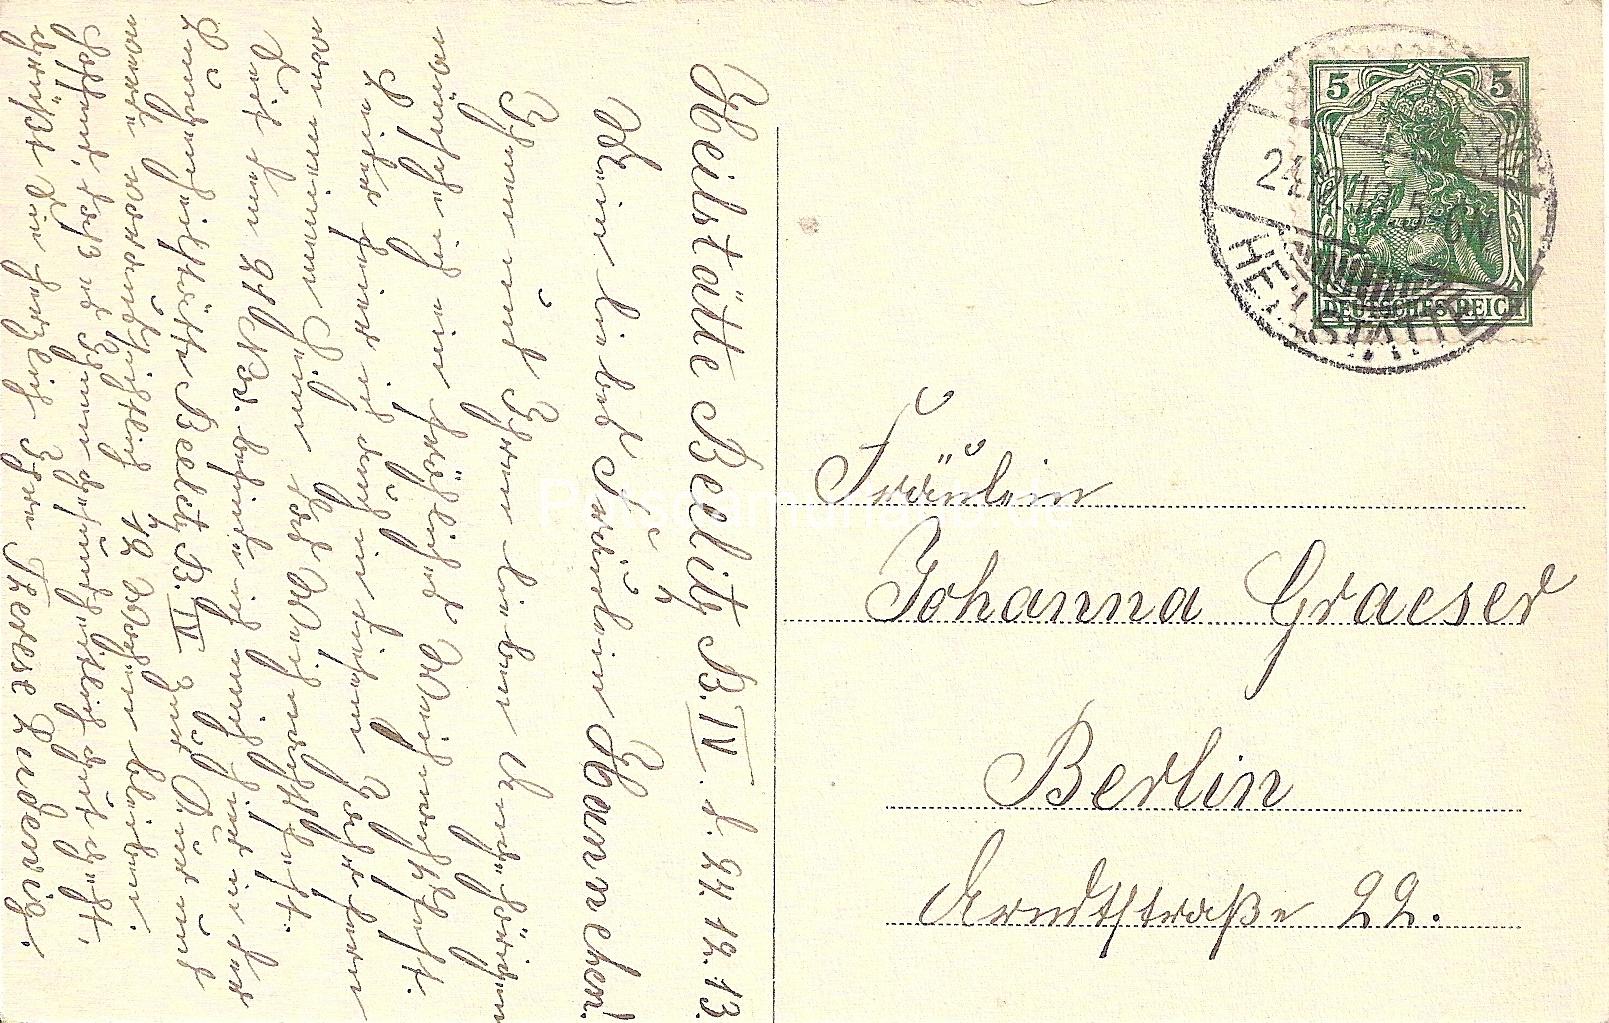 1913 12 24